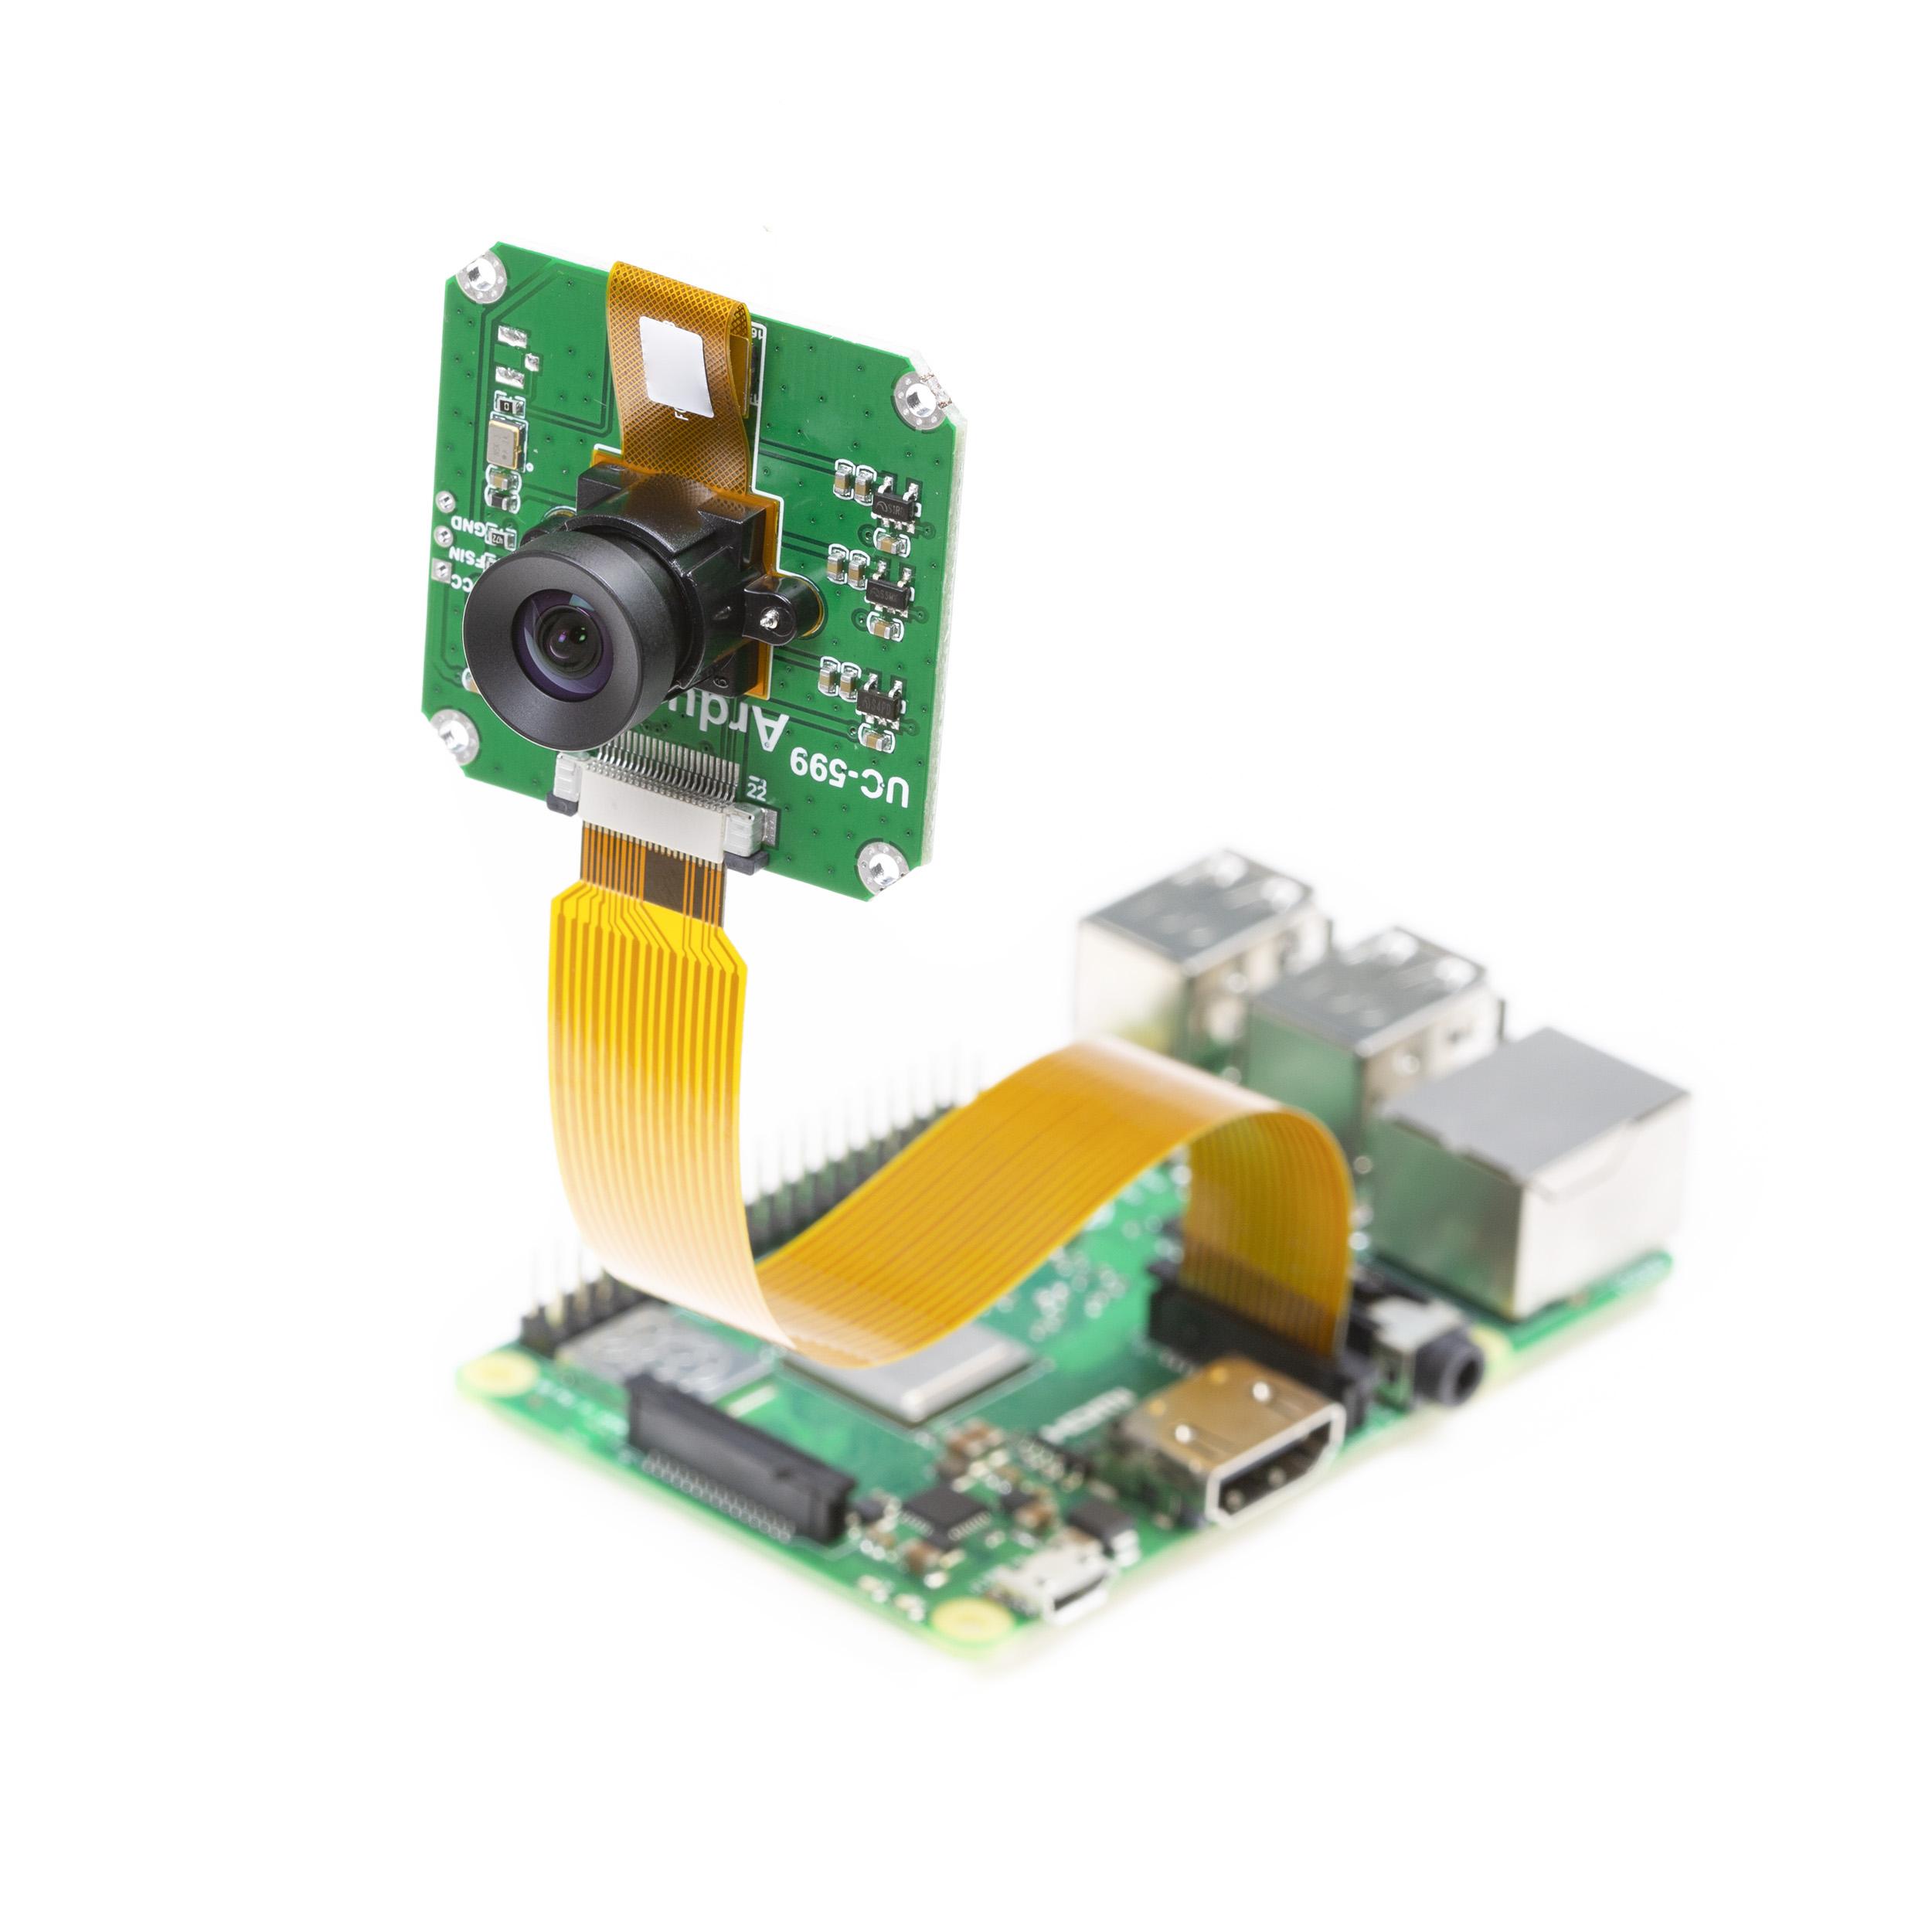 Arducam OV9281 MIPI 1MP Monochrome Global Shutter Camera Module with